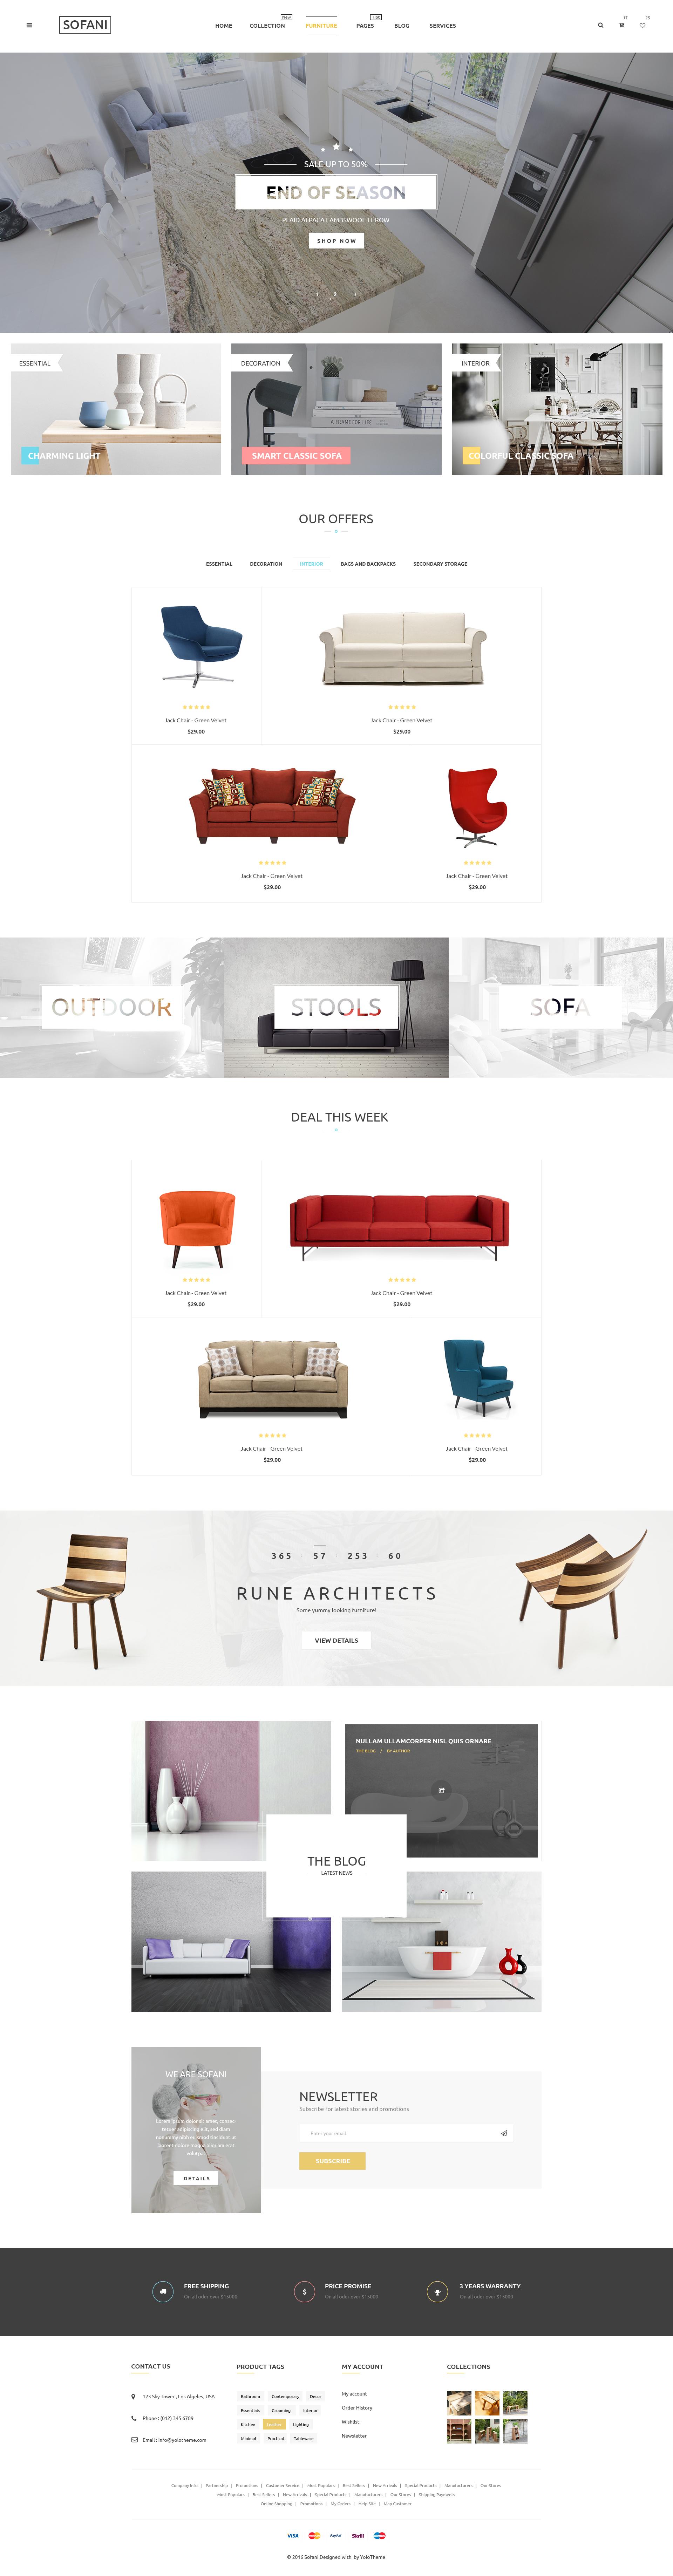 Sofani Furniture Store Woocommerce Wordpress Theme By Yolotheme Themeforest